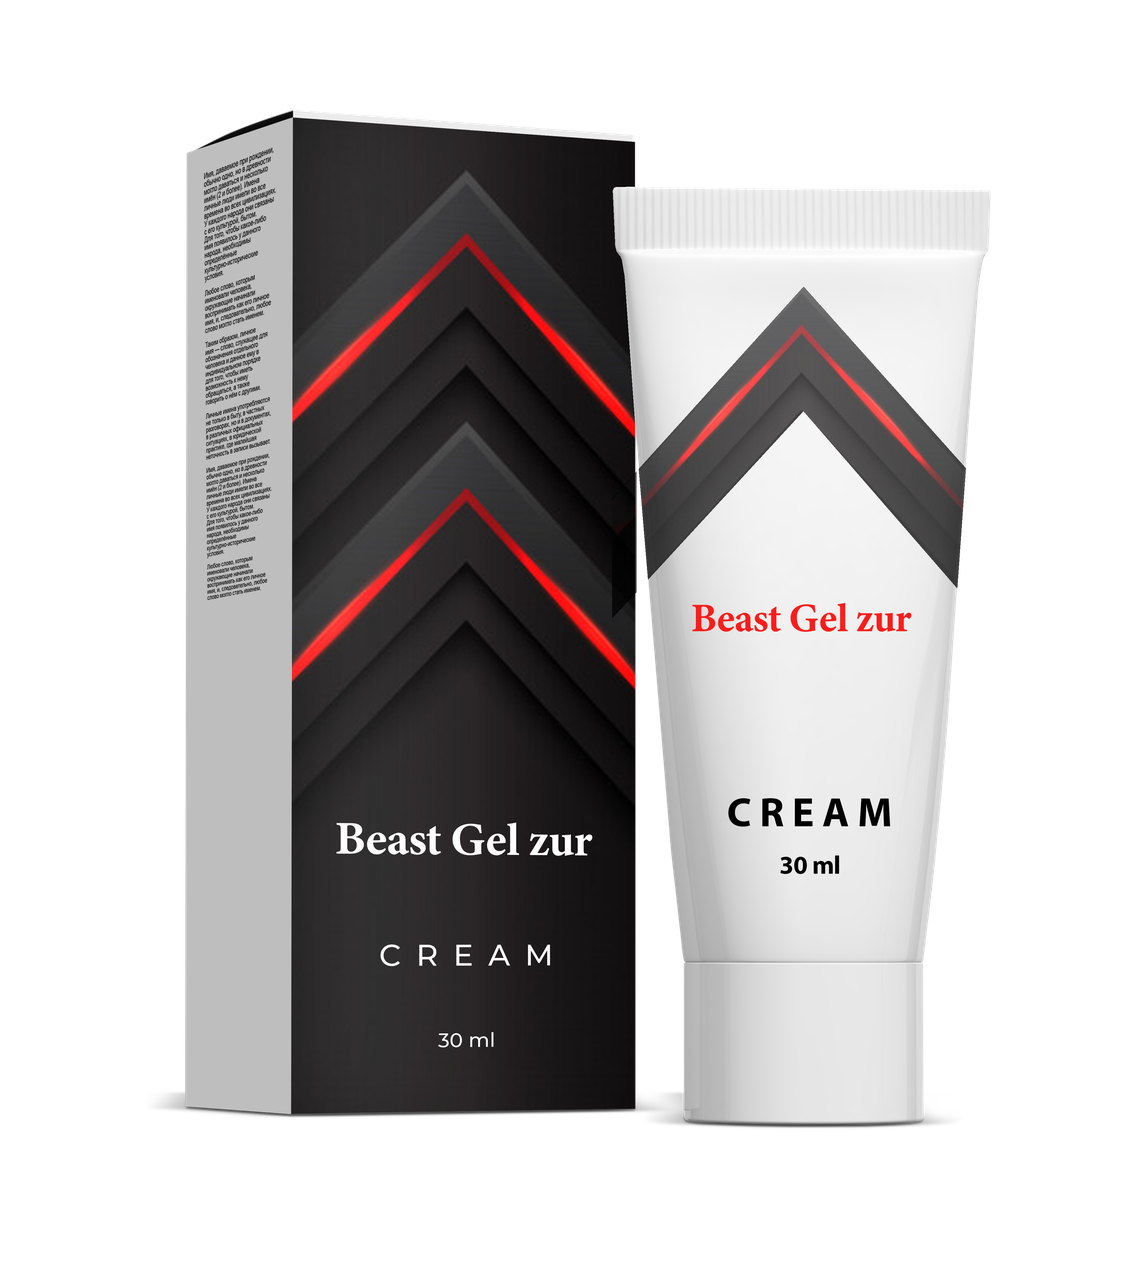 Beast Gel zur (Бэст Гель зур) – средство для потенции